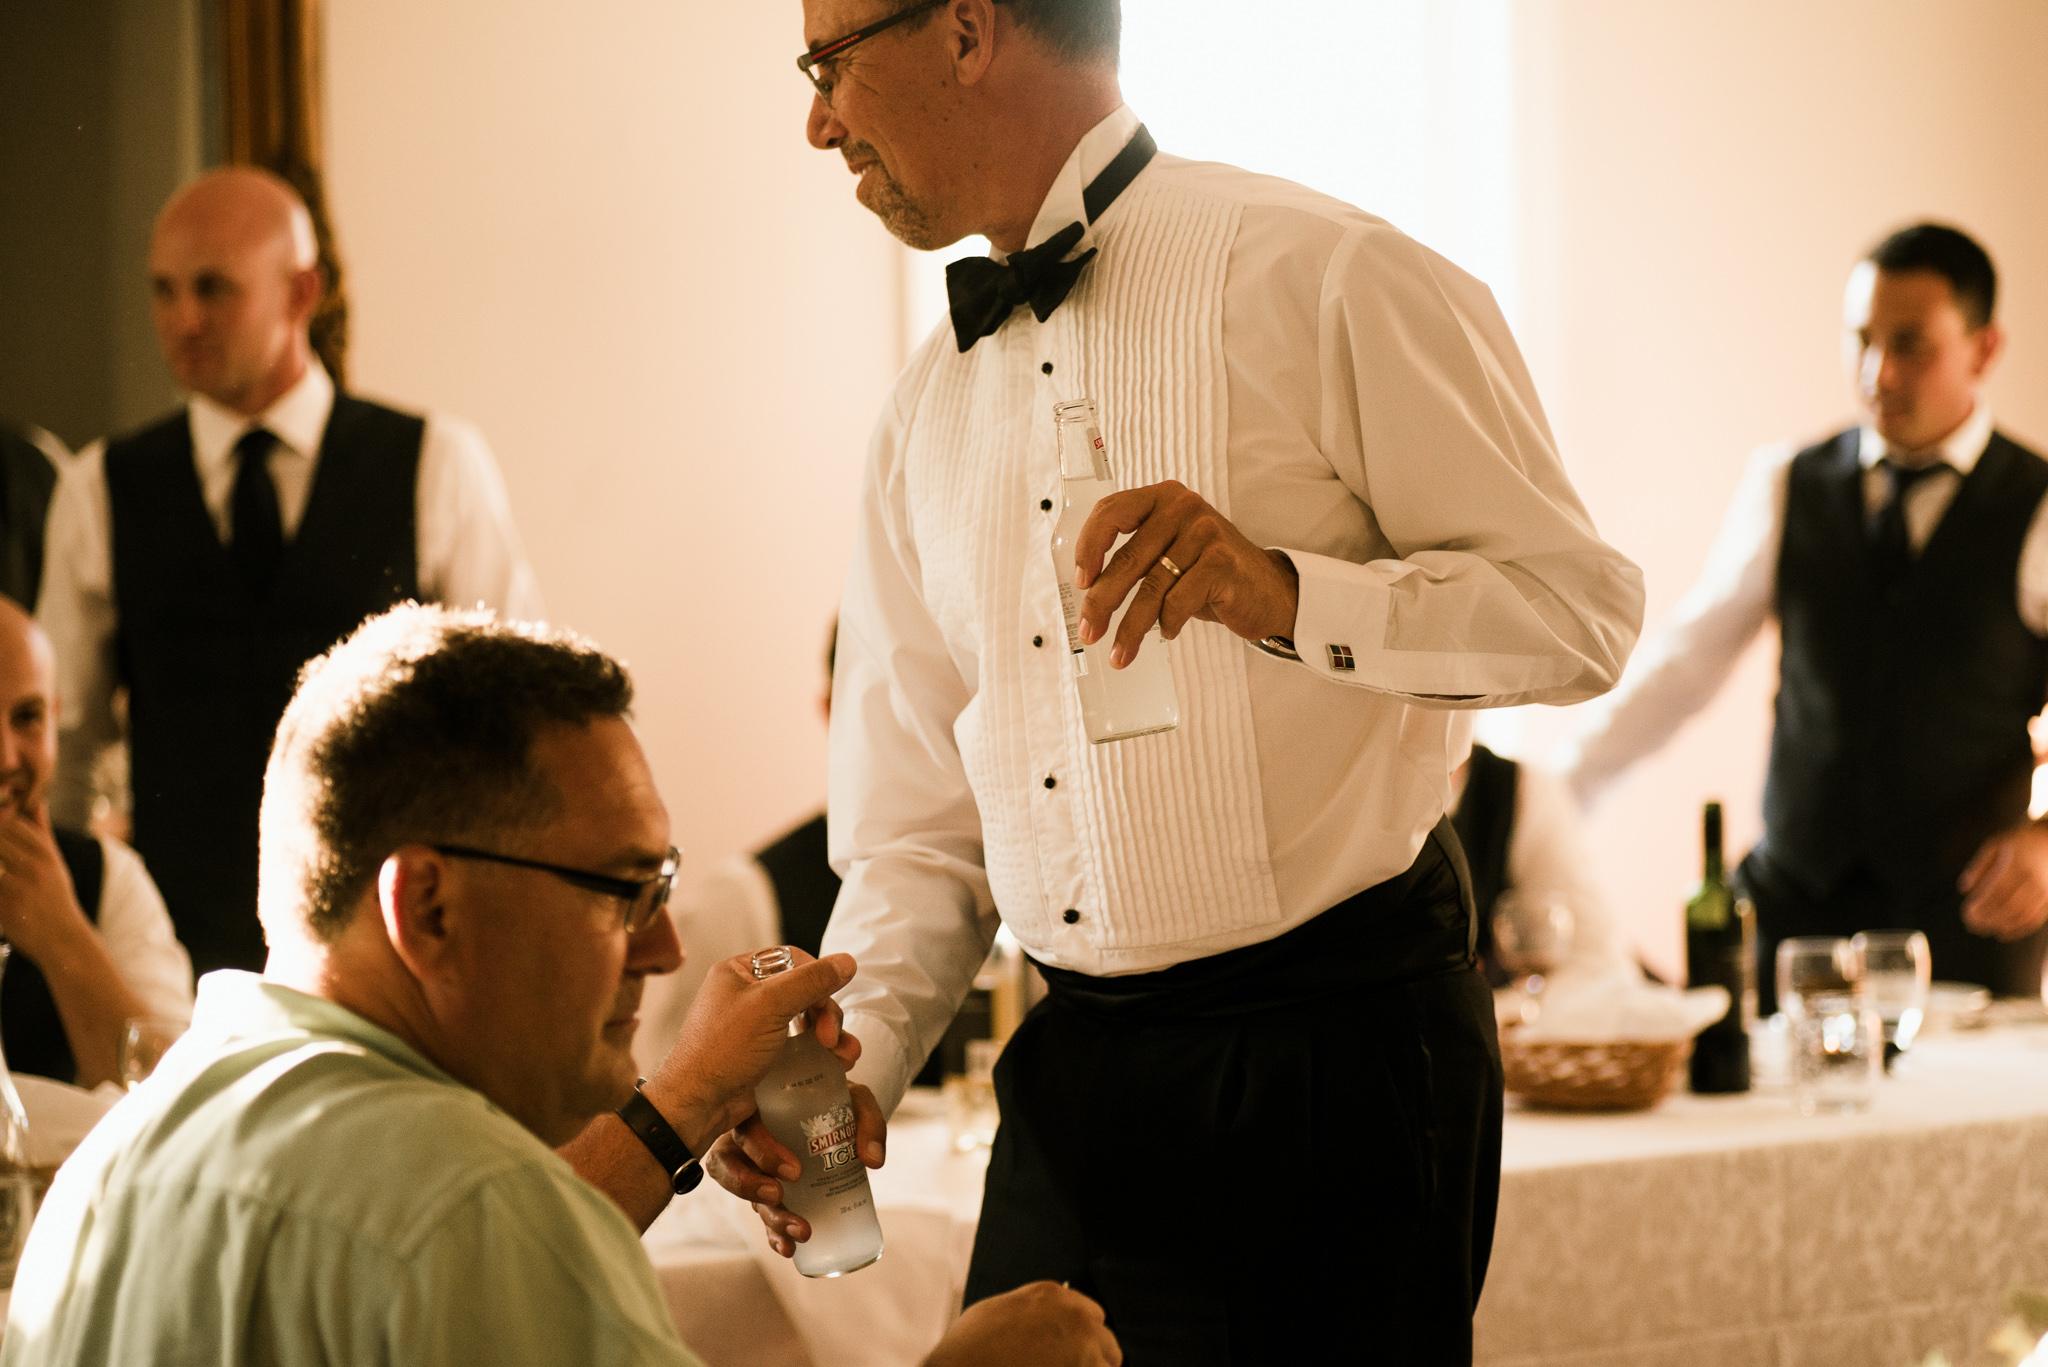 springer-house-burlington-wedding-photographer-531-of-756.jpg